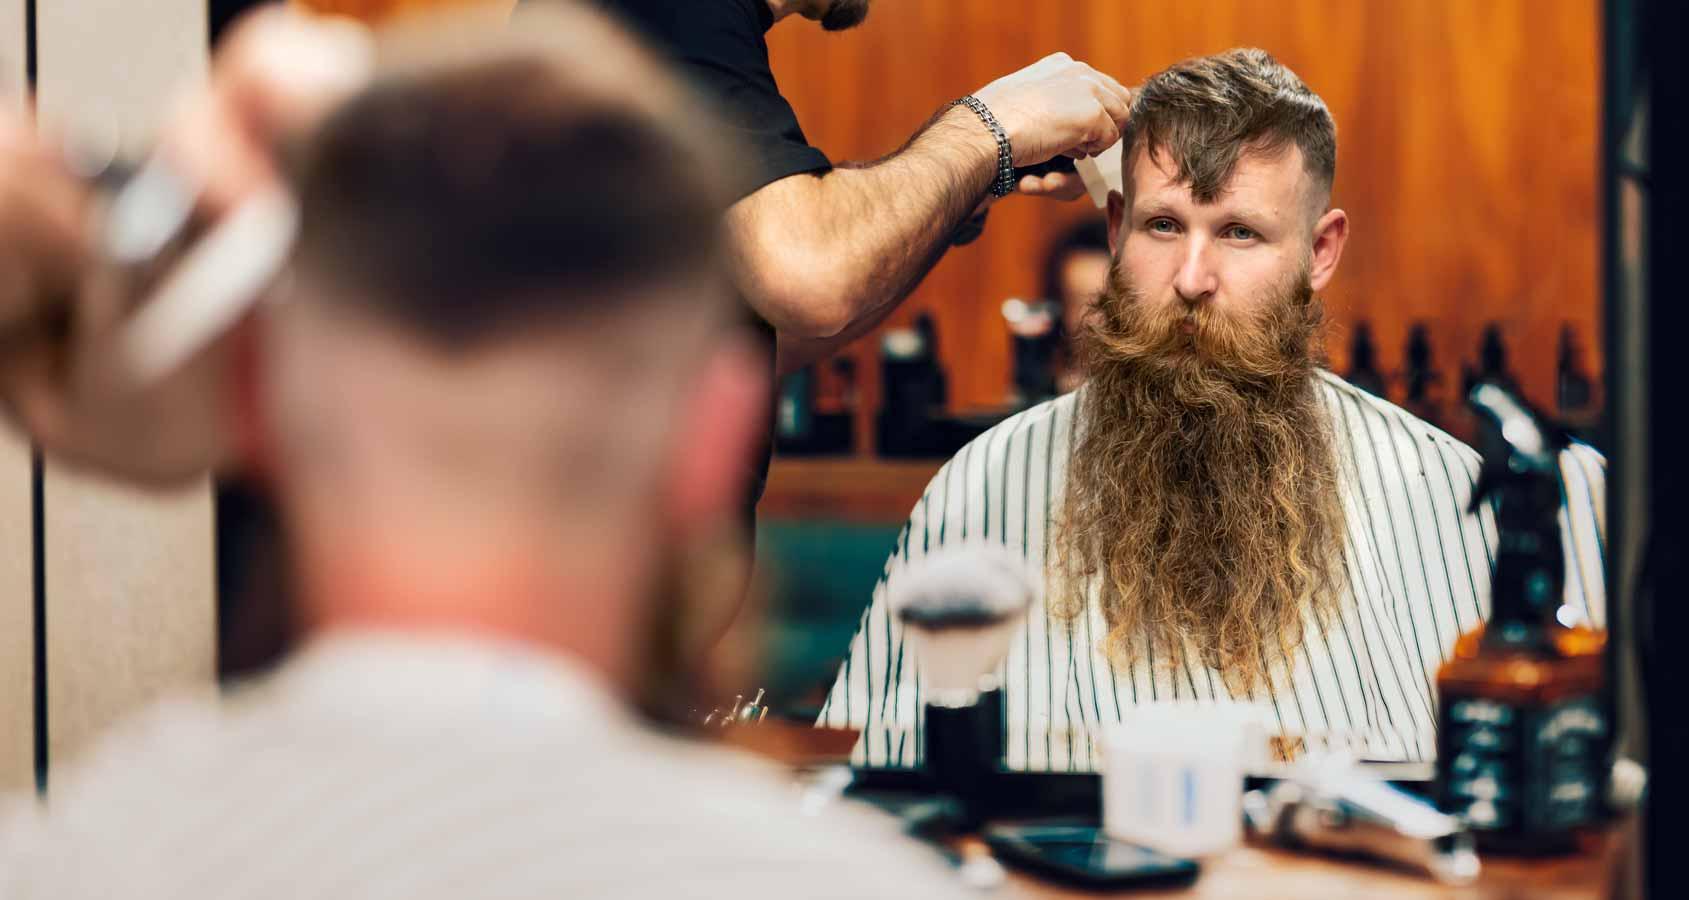 Man With Great Beard